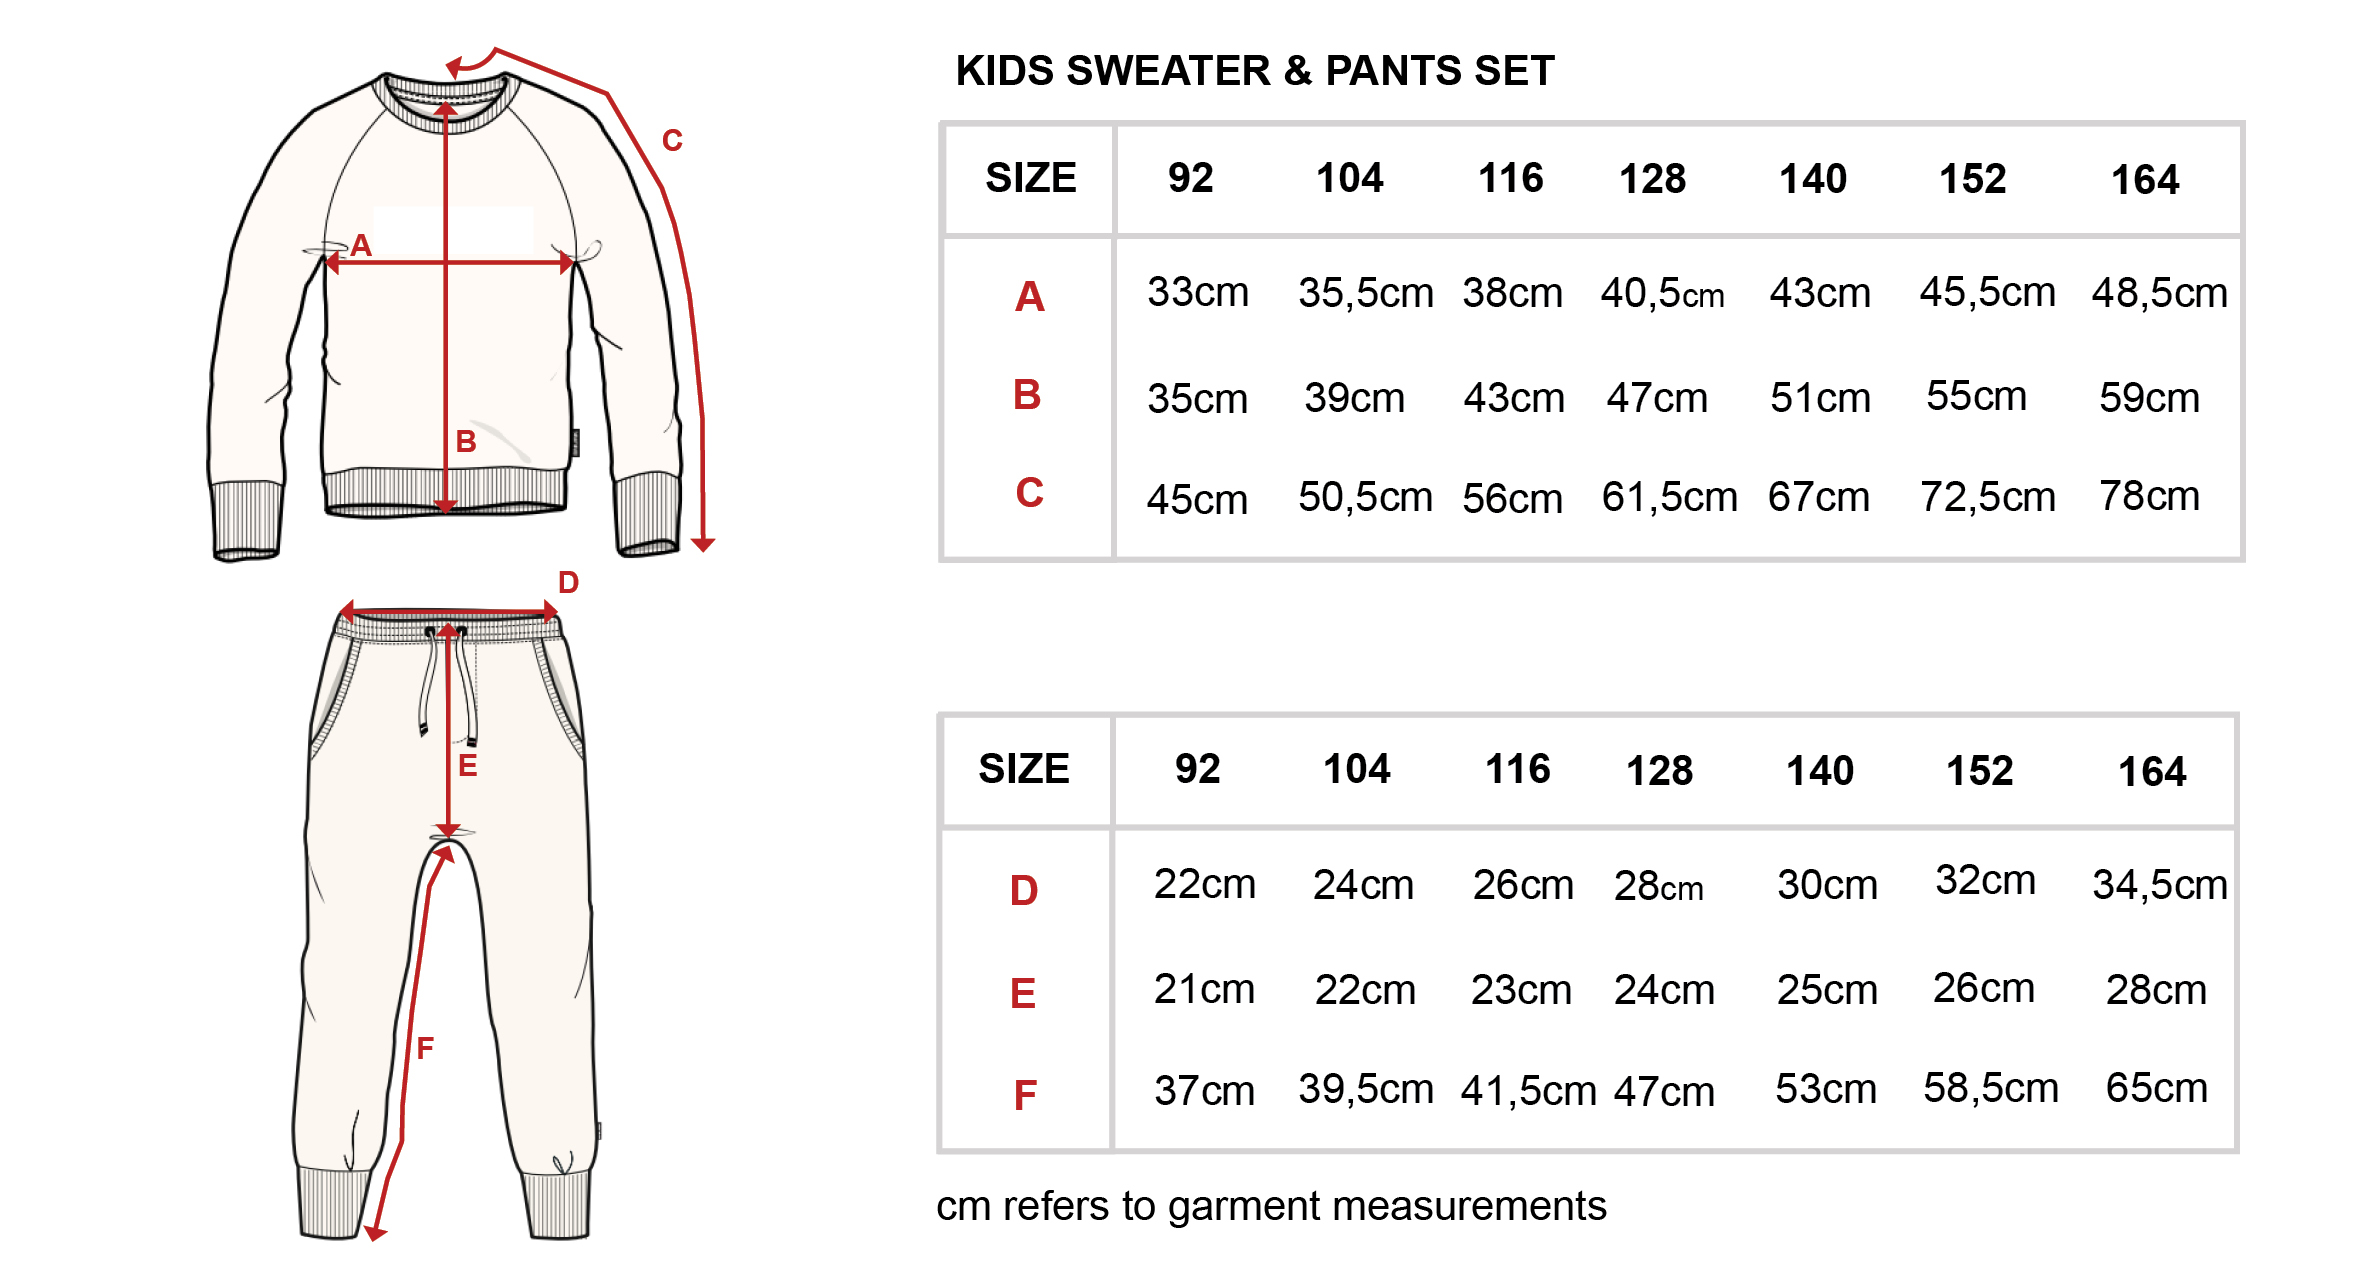 FW20-Kids-Sweater-Pants-Set